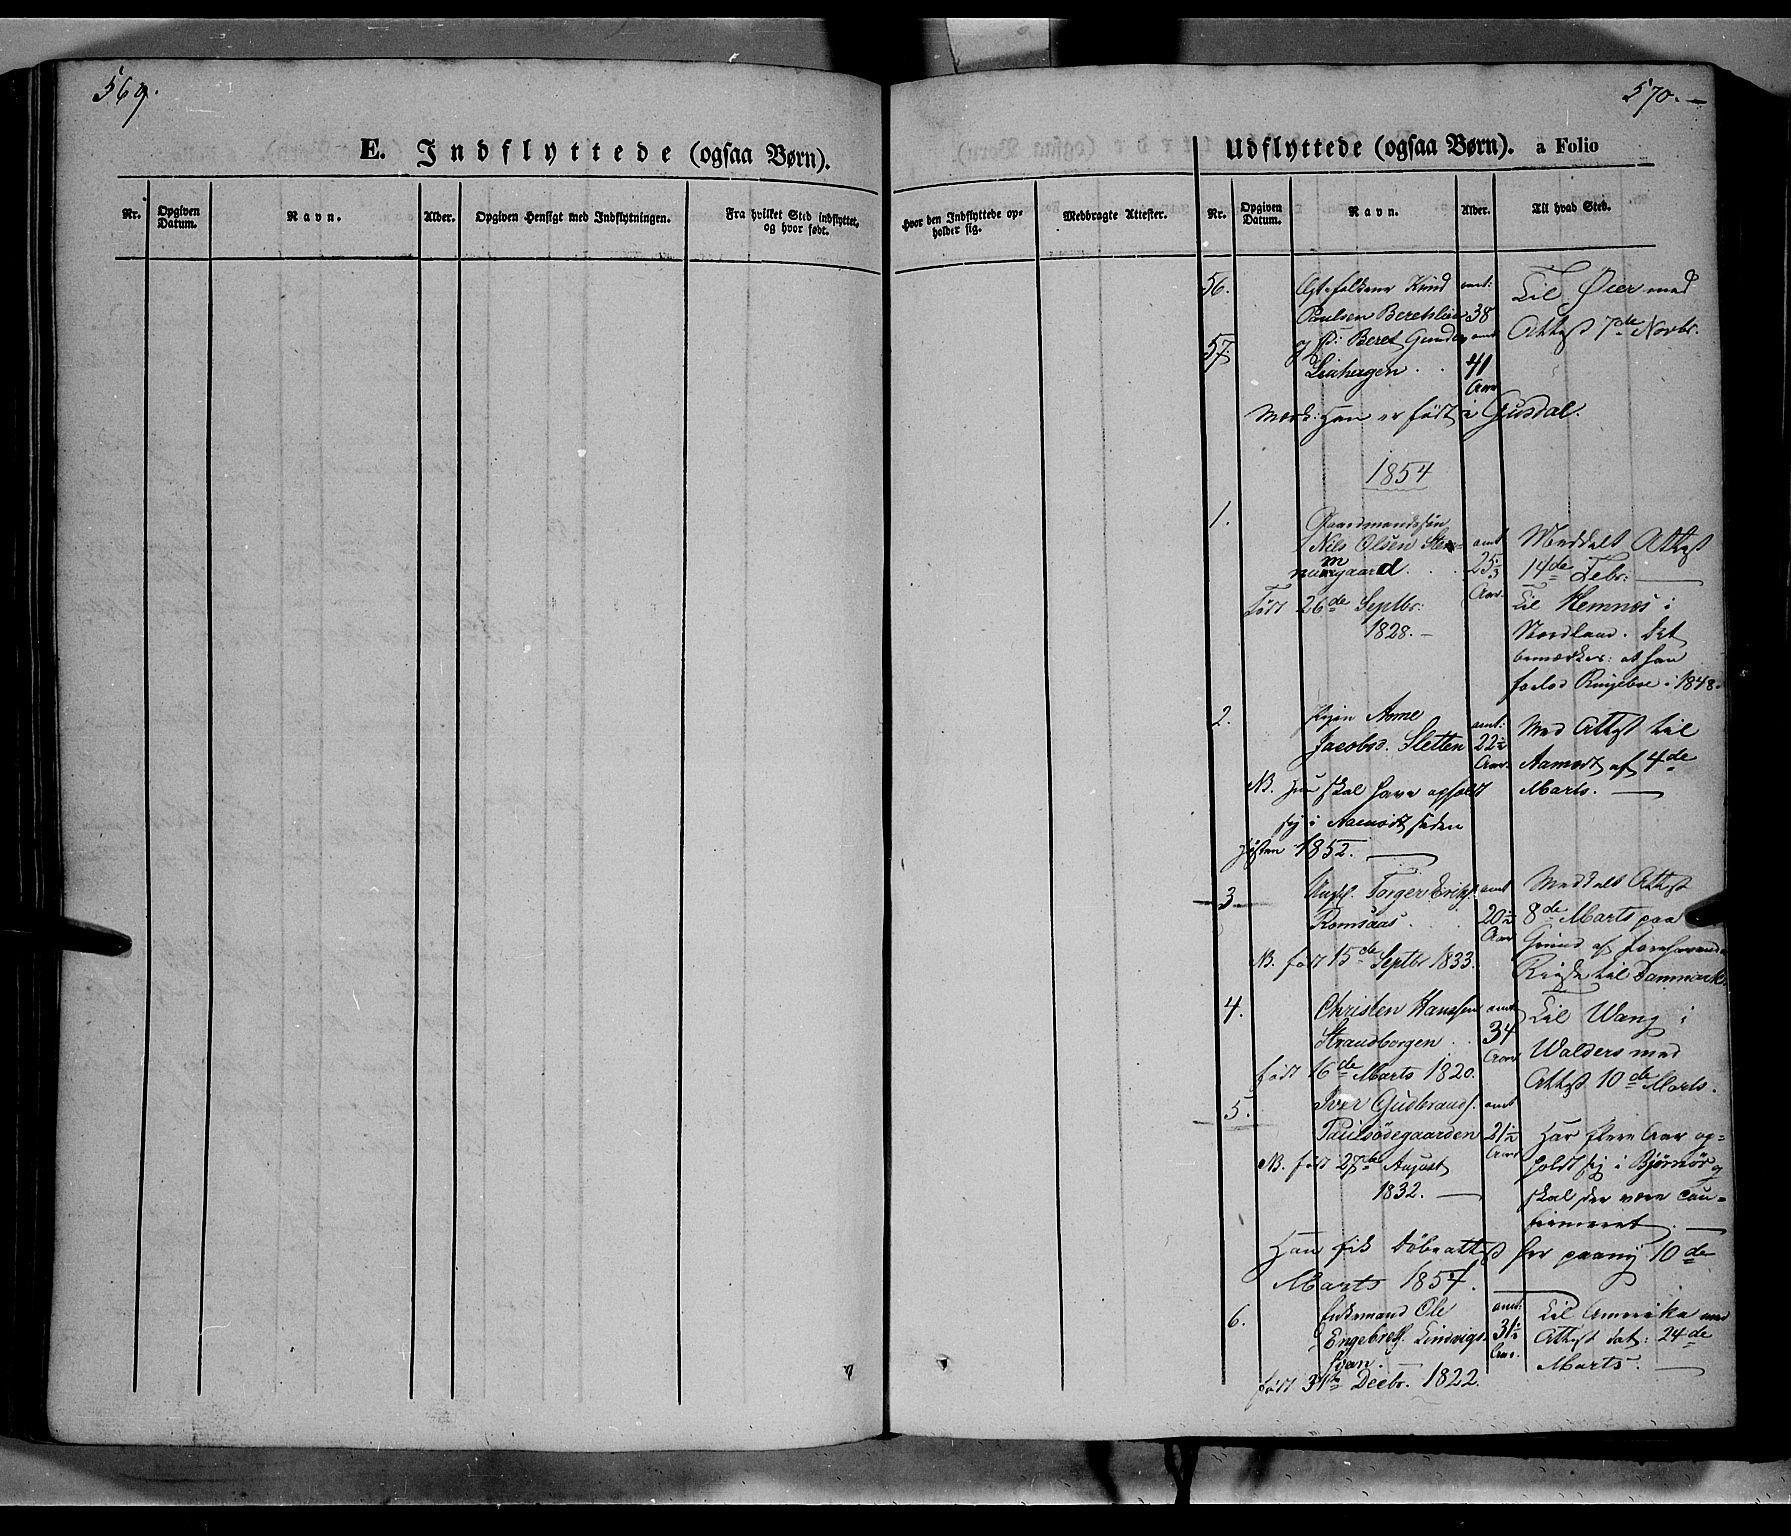 SAH, Ringebu prestekontor, Ministerialbok nr. 6, 1848-1859, s. 569-570